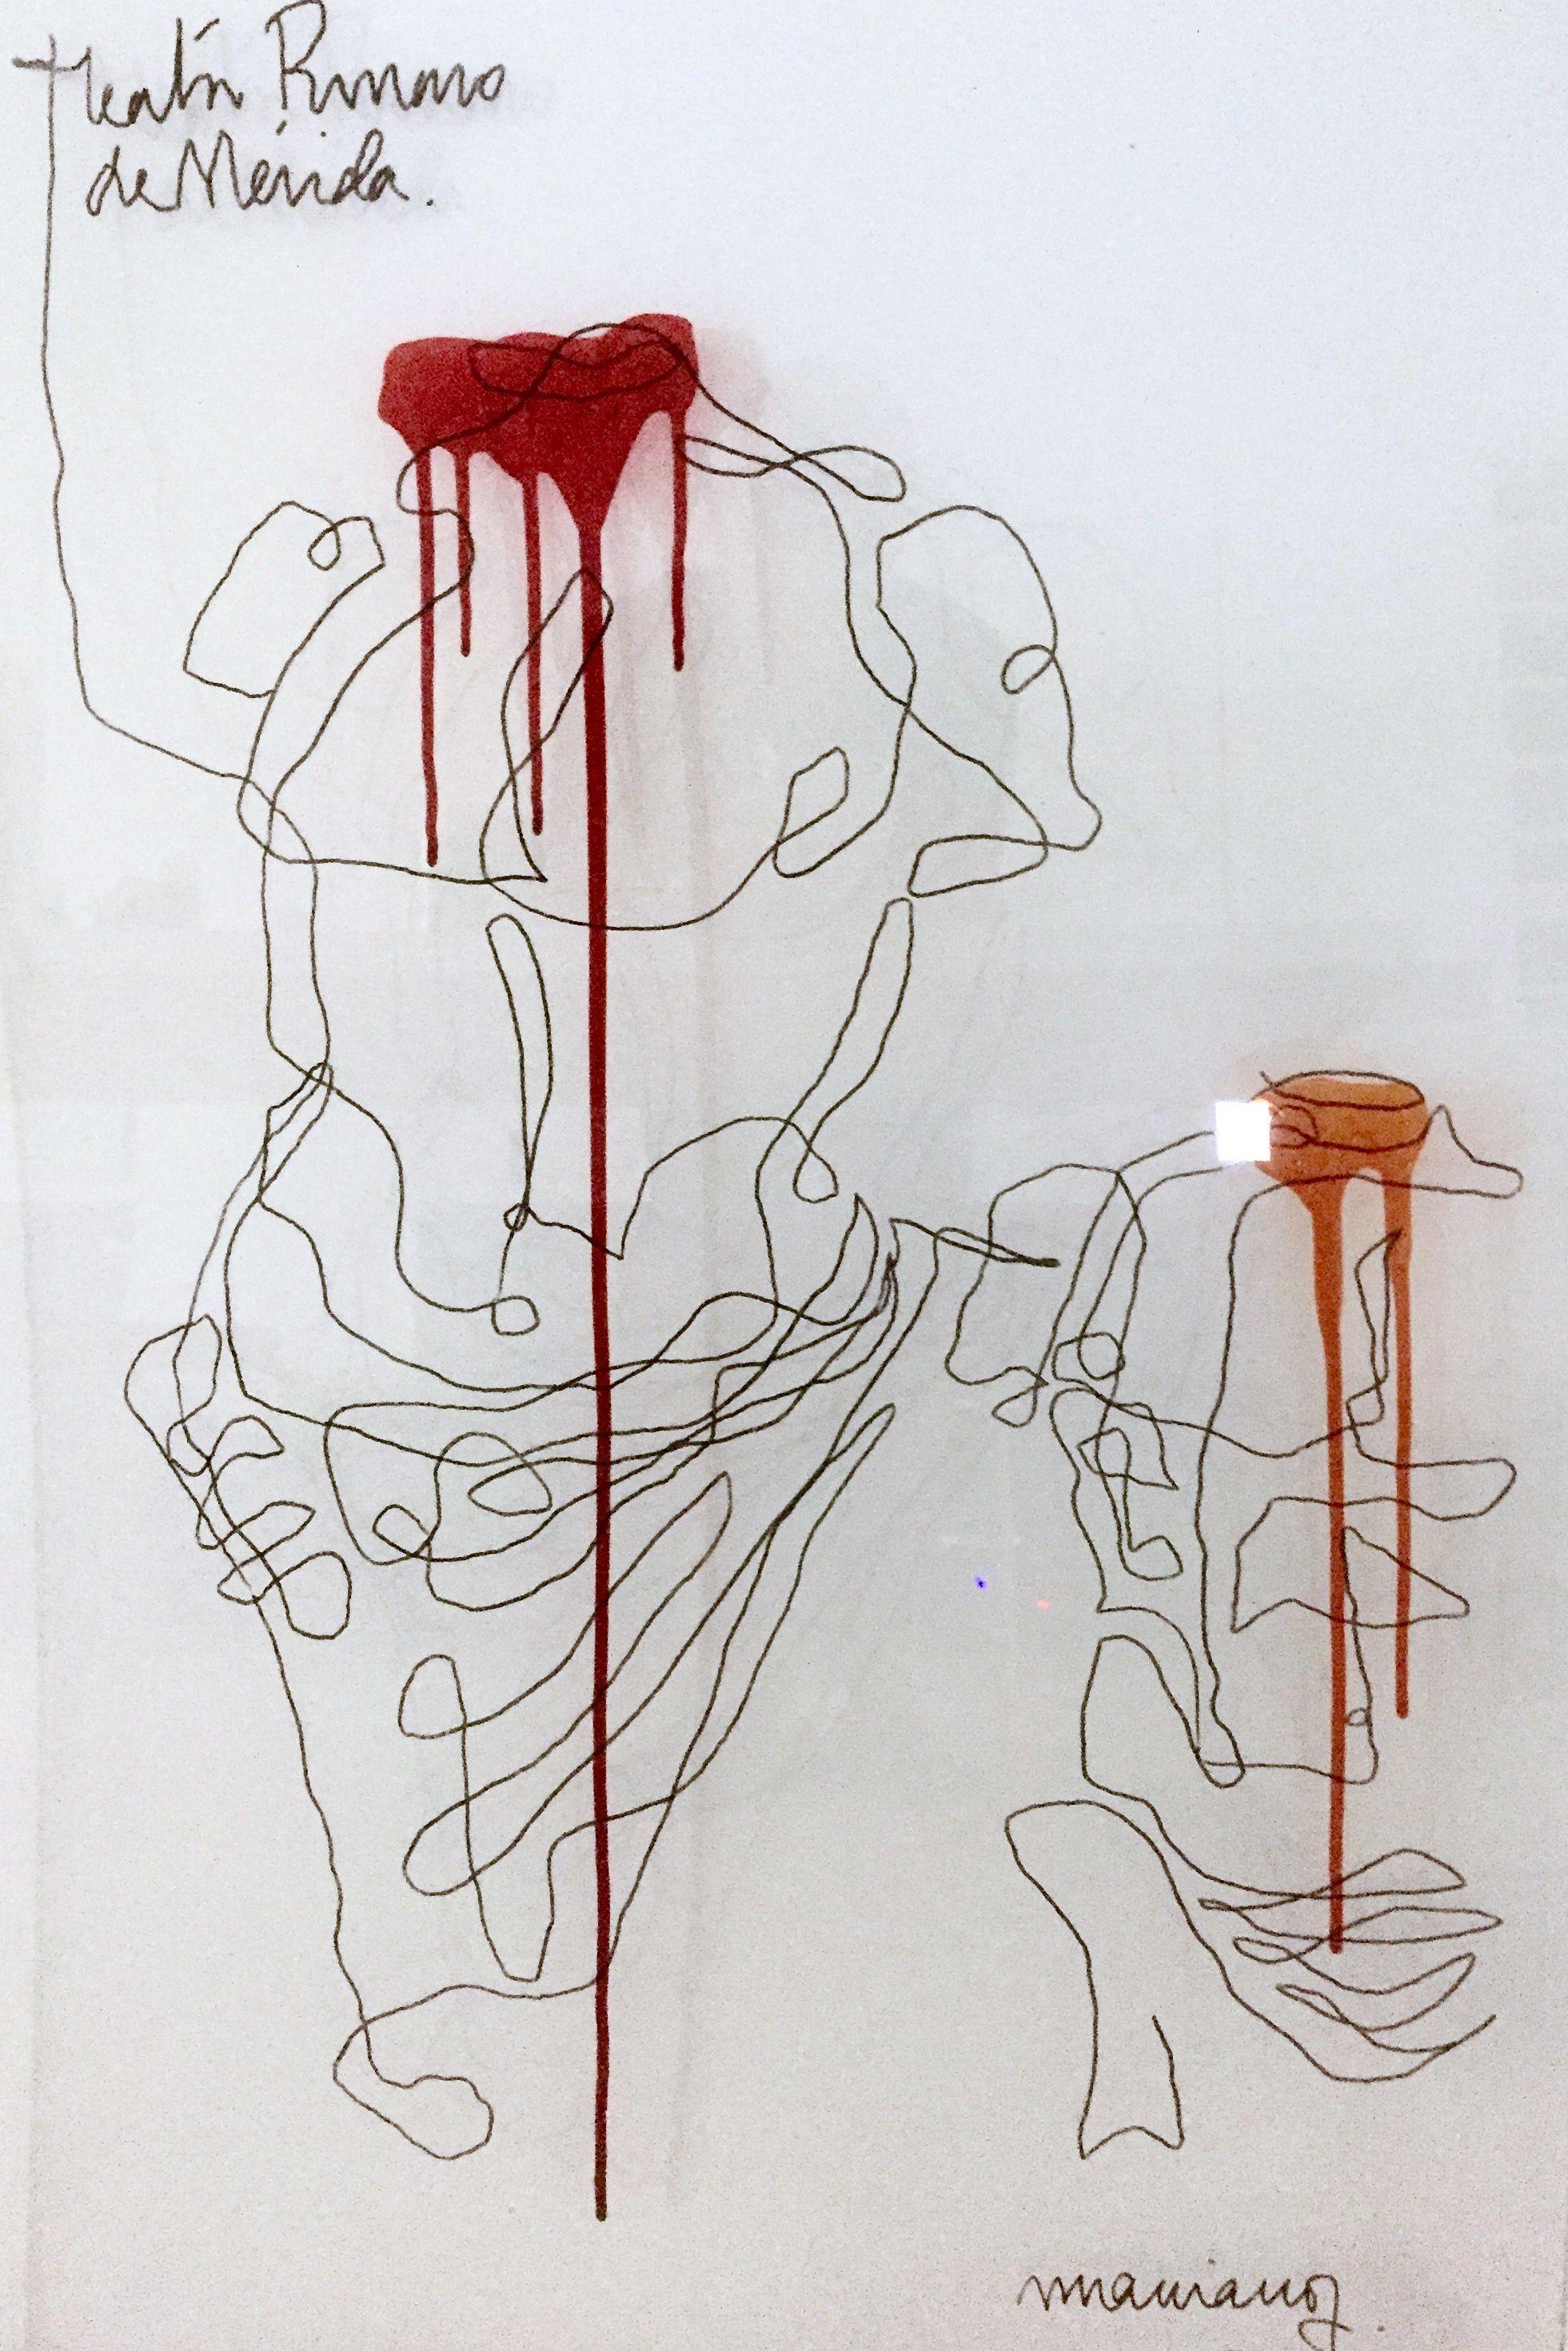 Pintando sobre vidrio... #marianodibuja #marianopintasobrevidrio  @Museo Arqueológico